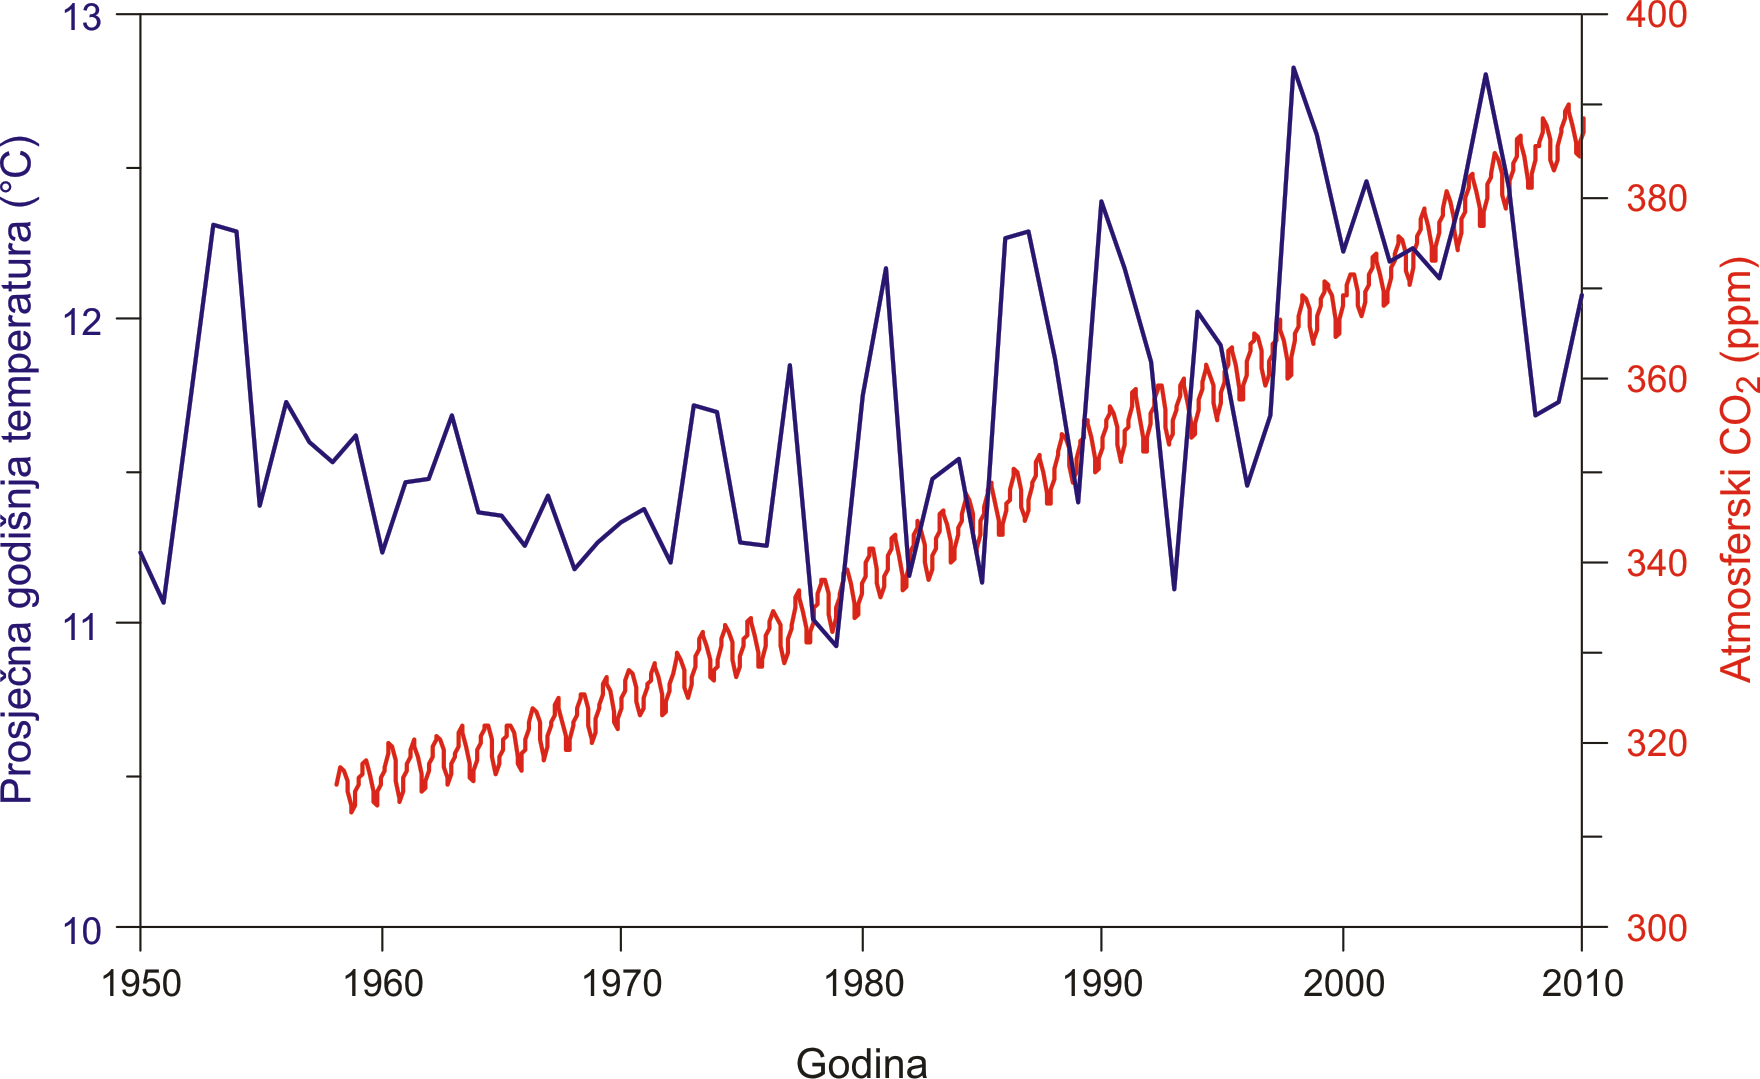 Koncentracija CO2 u atmosferi